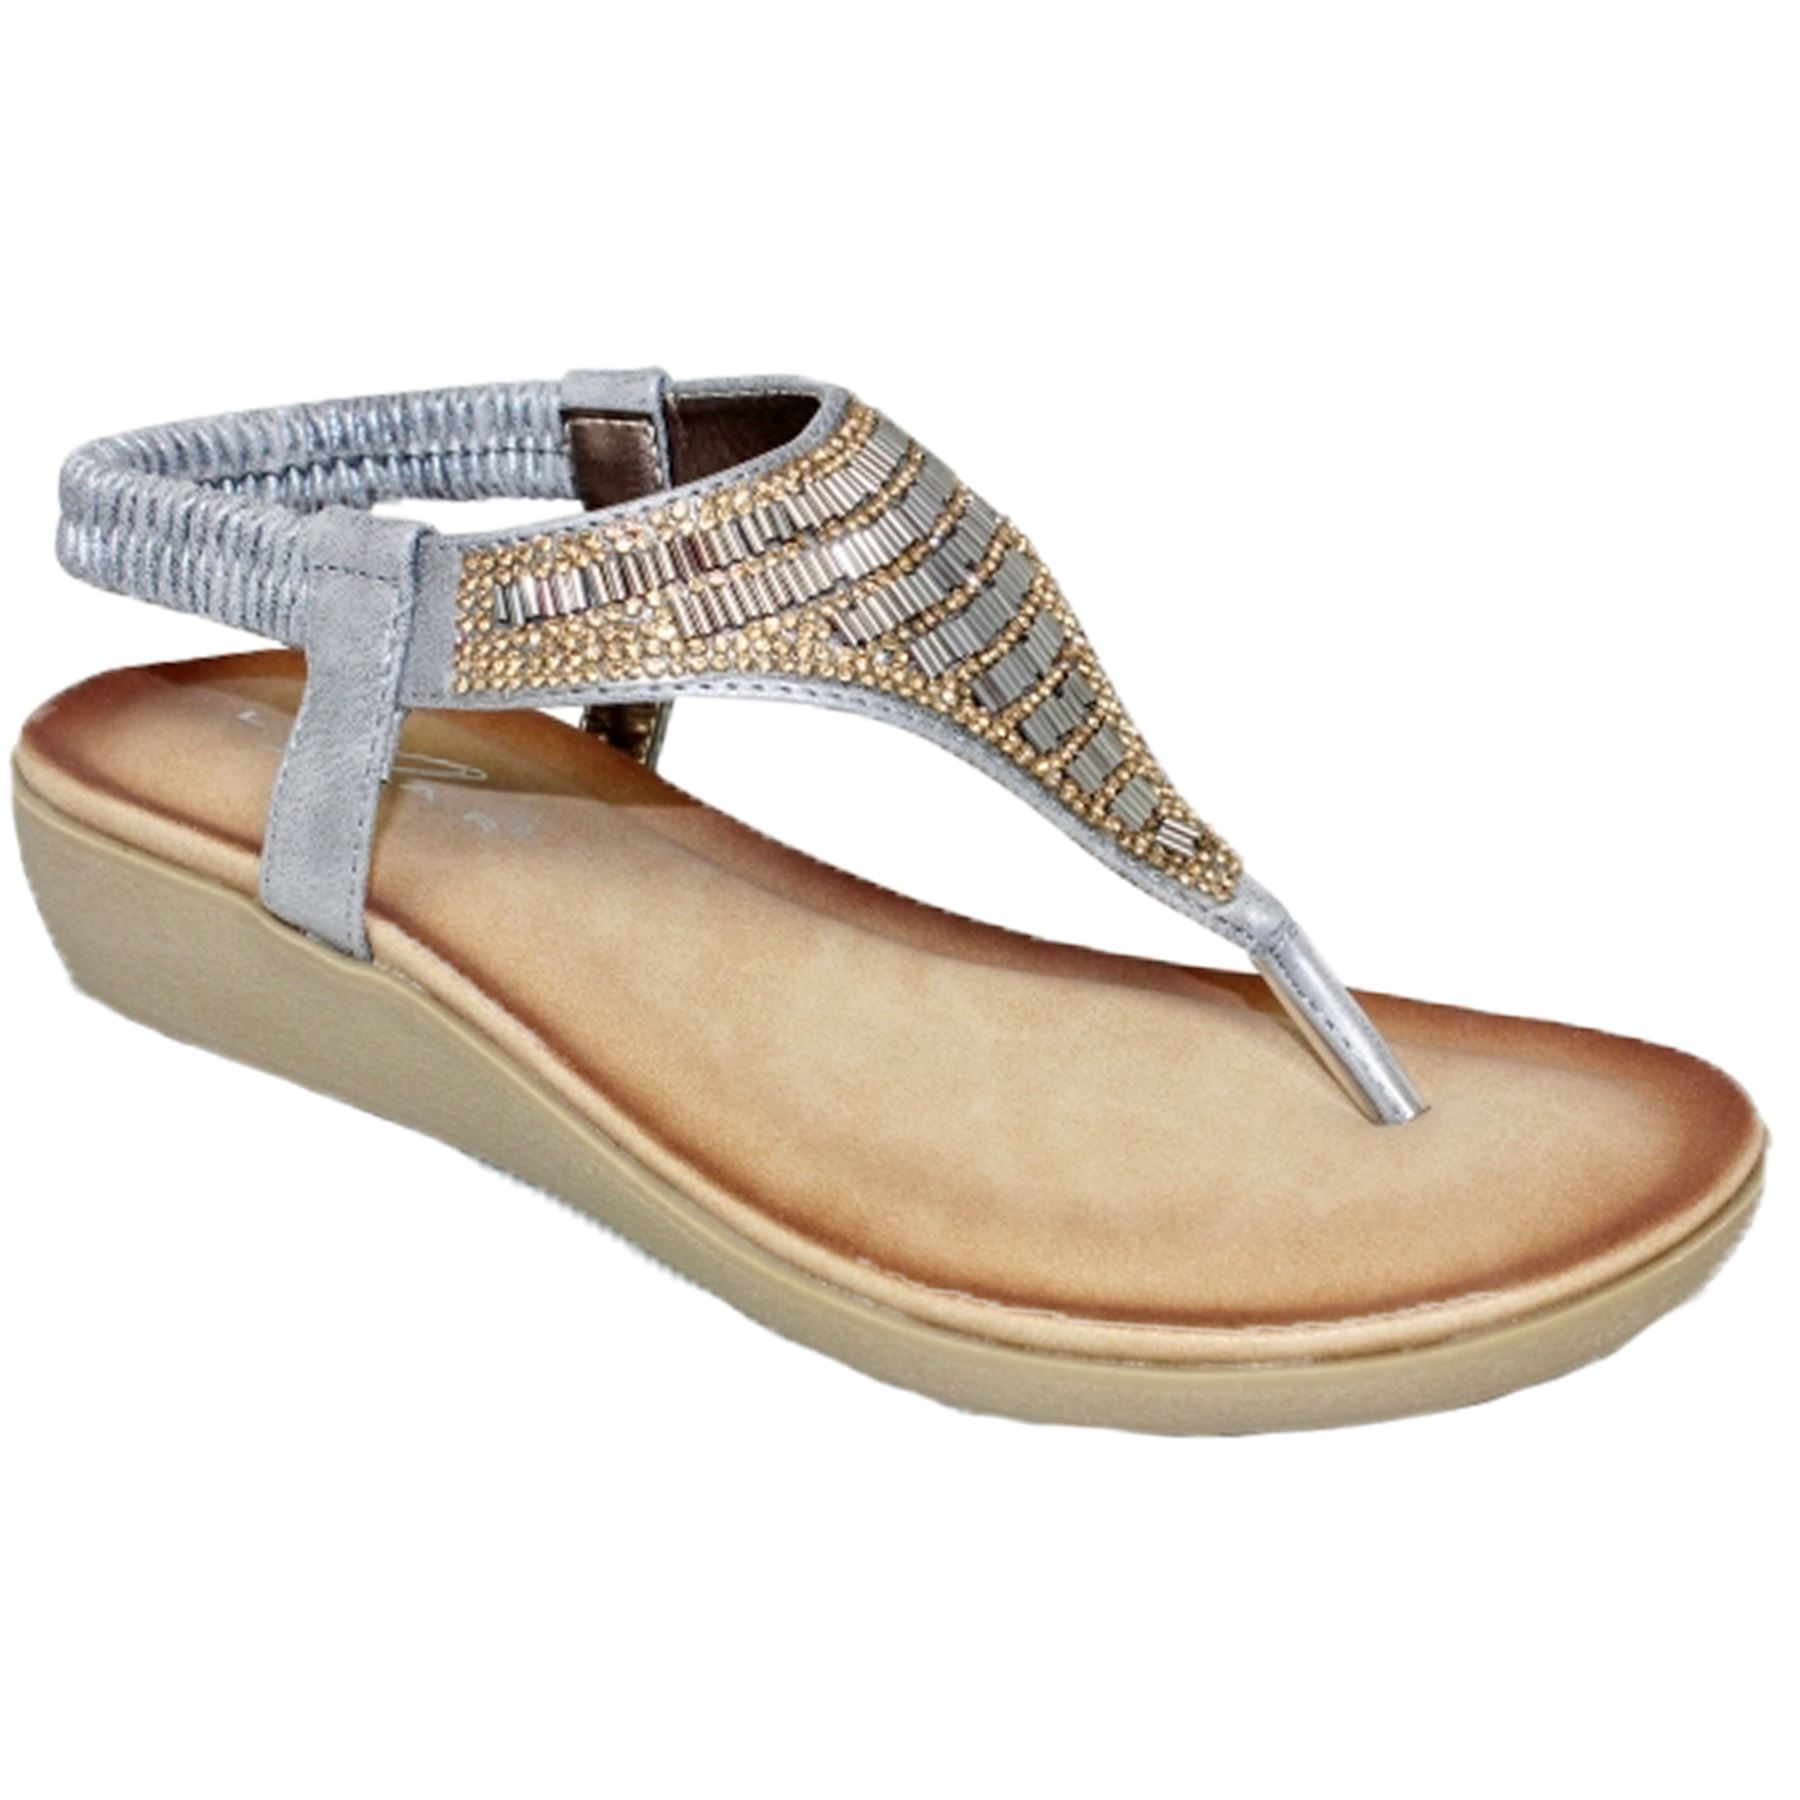 Jlh908 Adeline Gemstone Elasticated Ankle Strap Padded Insole Tendencies Sandals Footbed 2 Brown 42